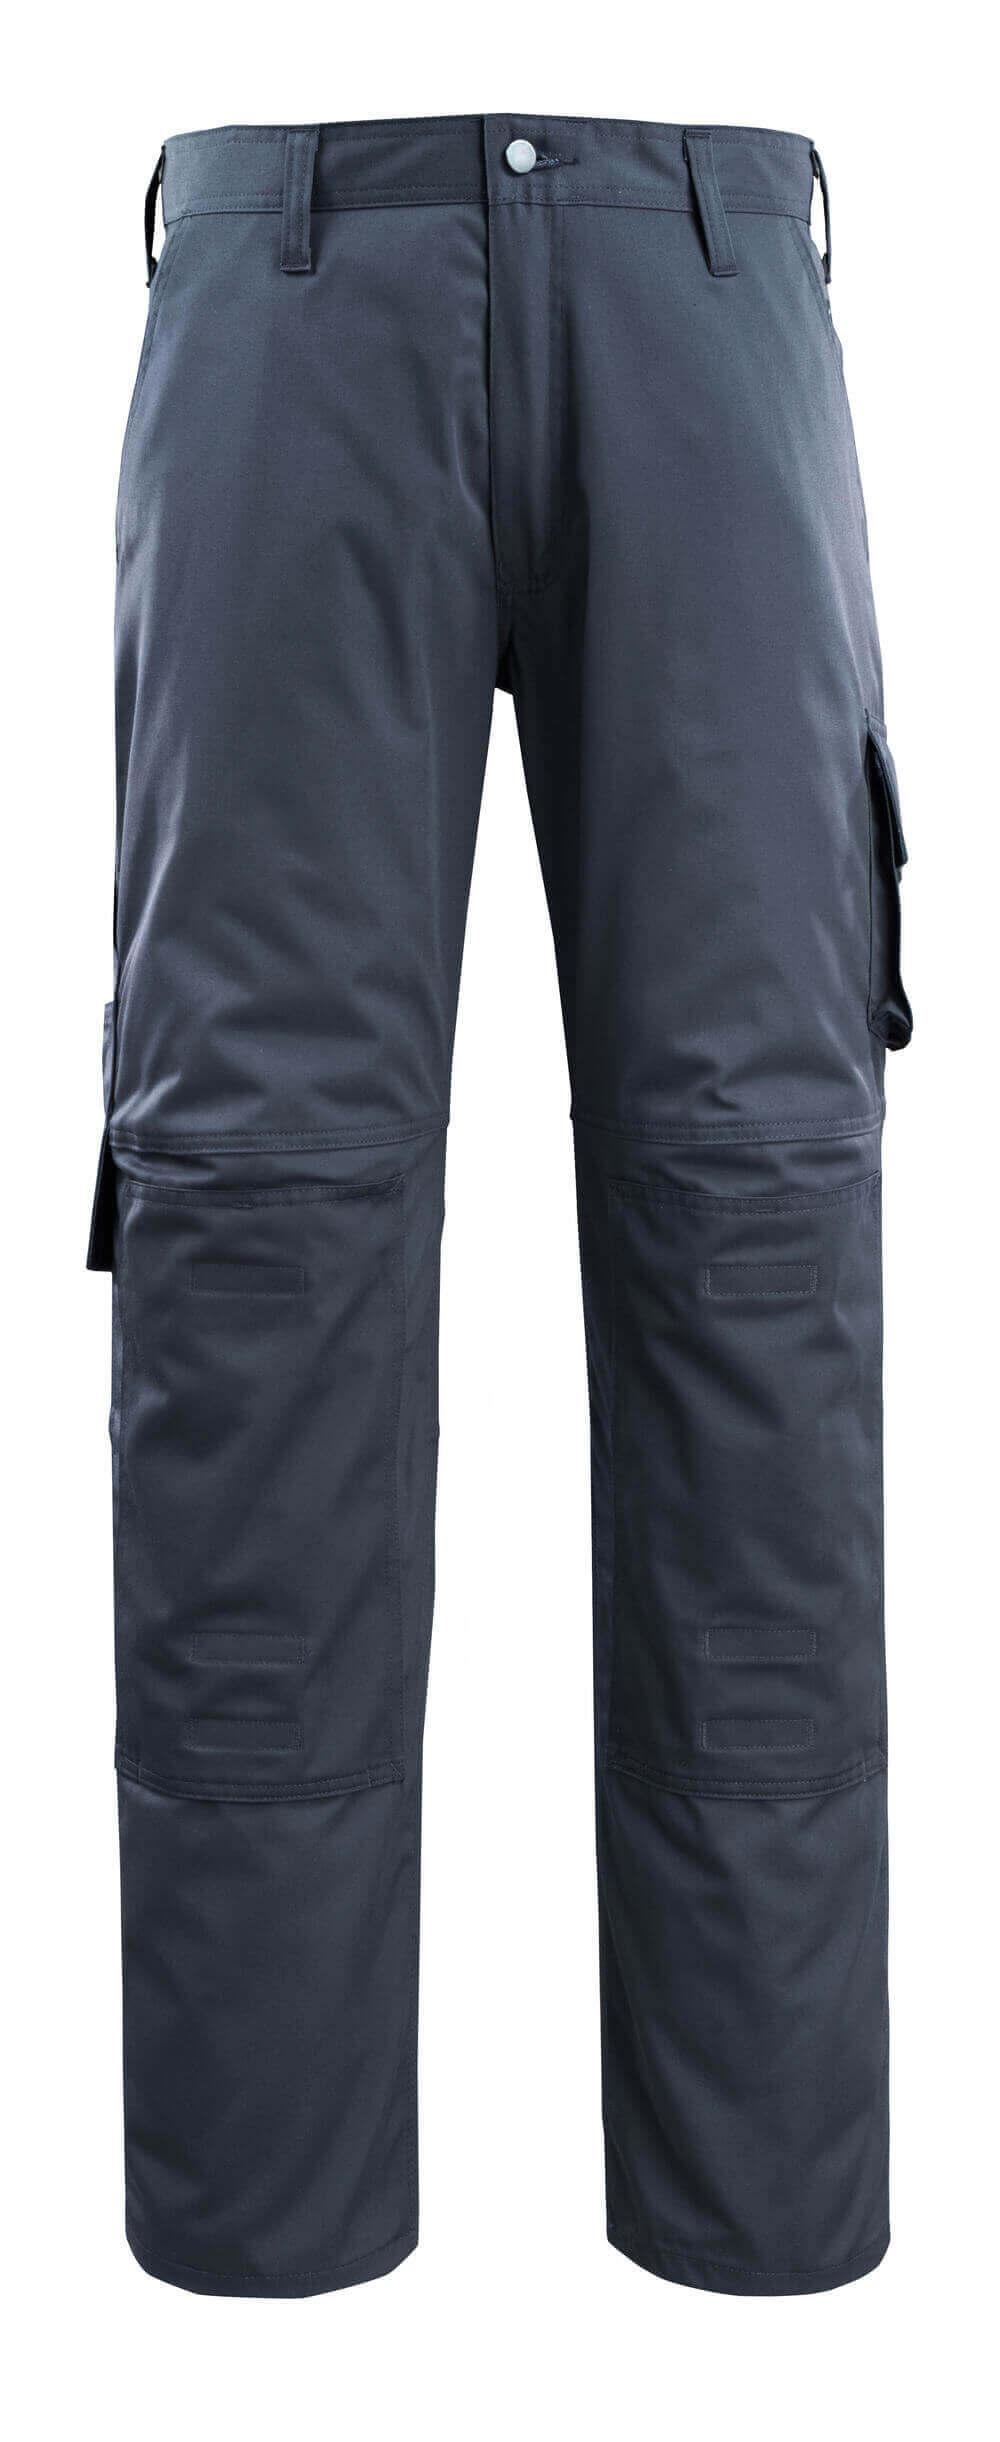 14379-850-010 Broek met kniezakken - donkermarine